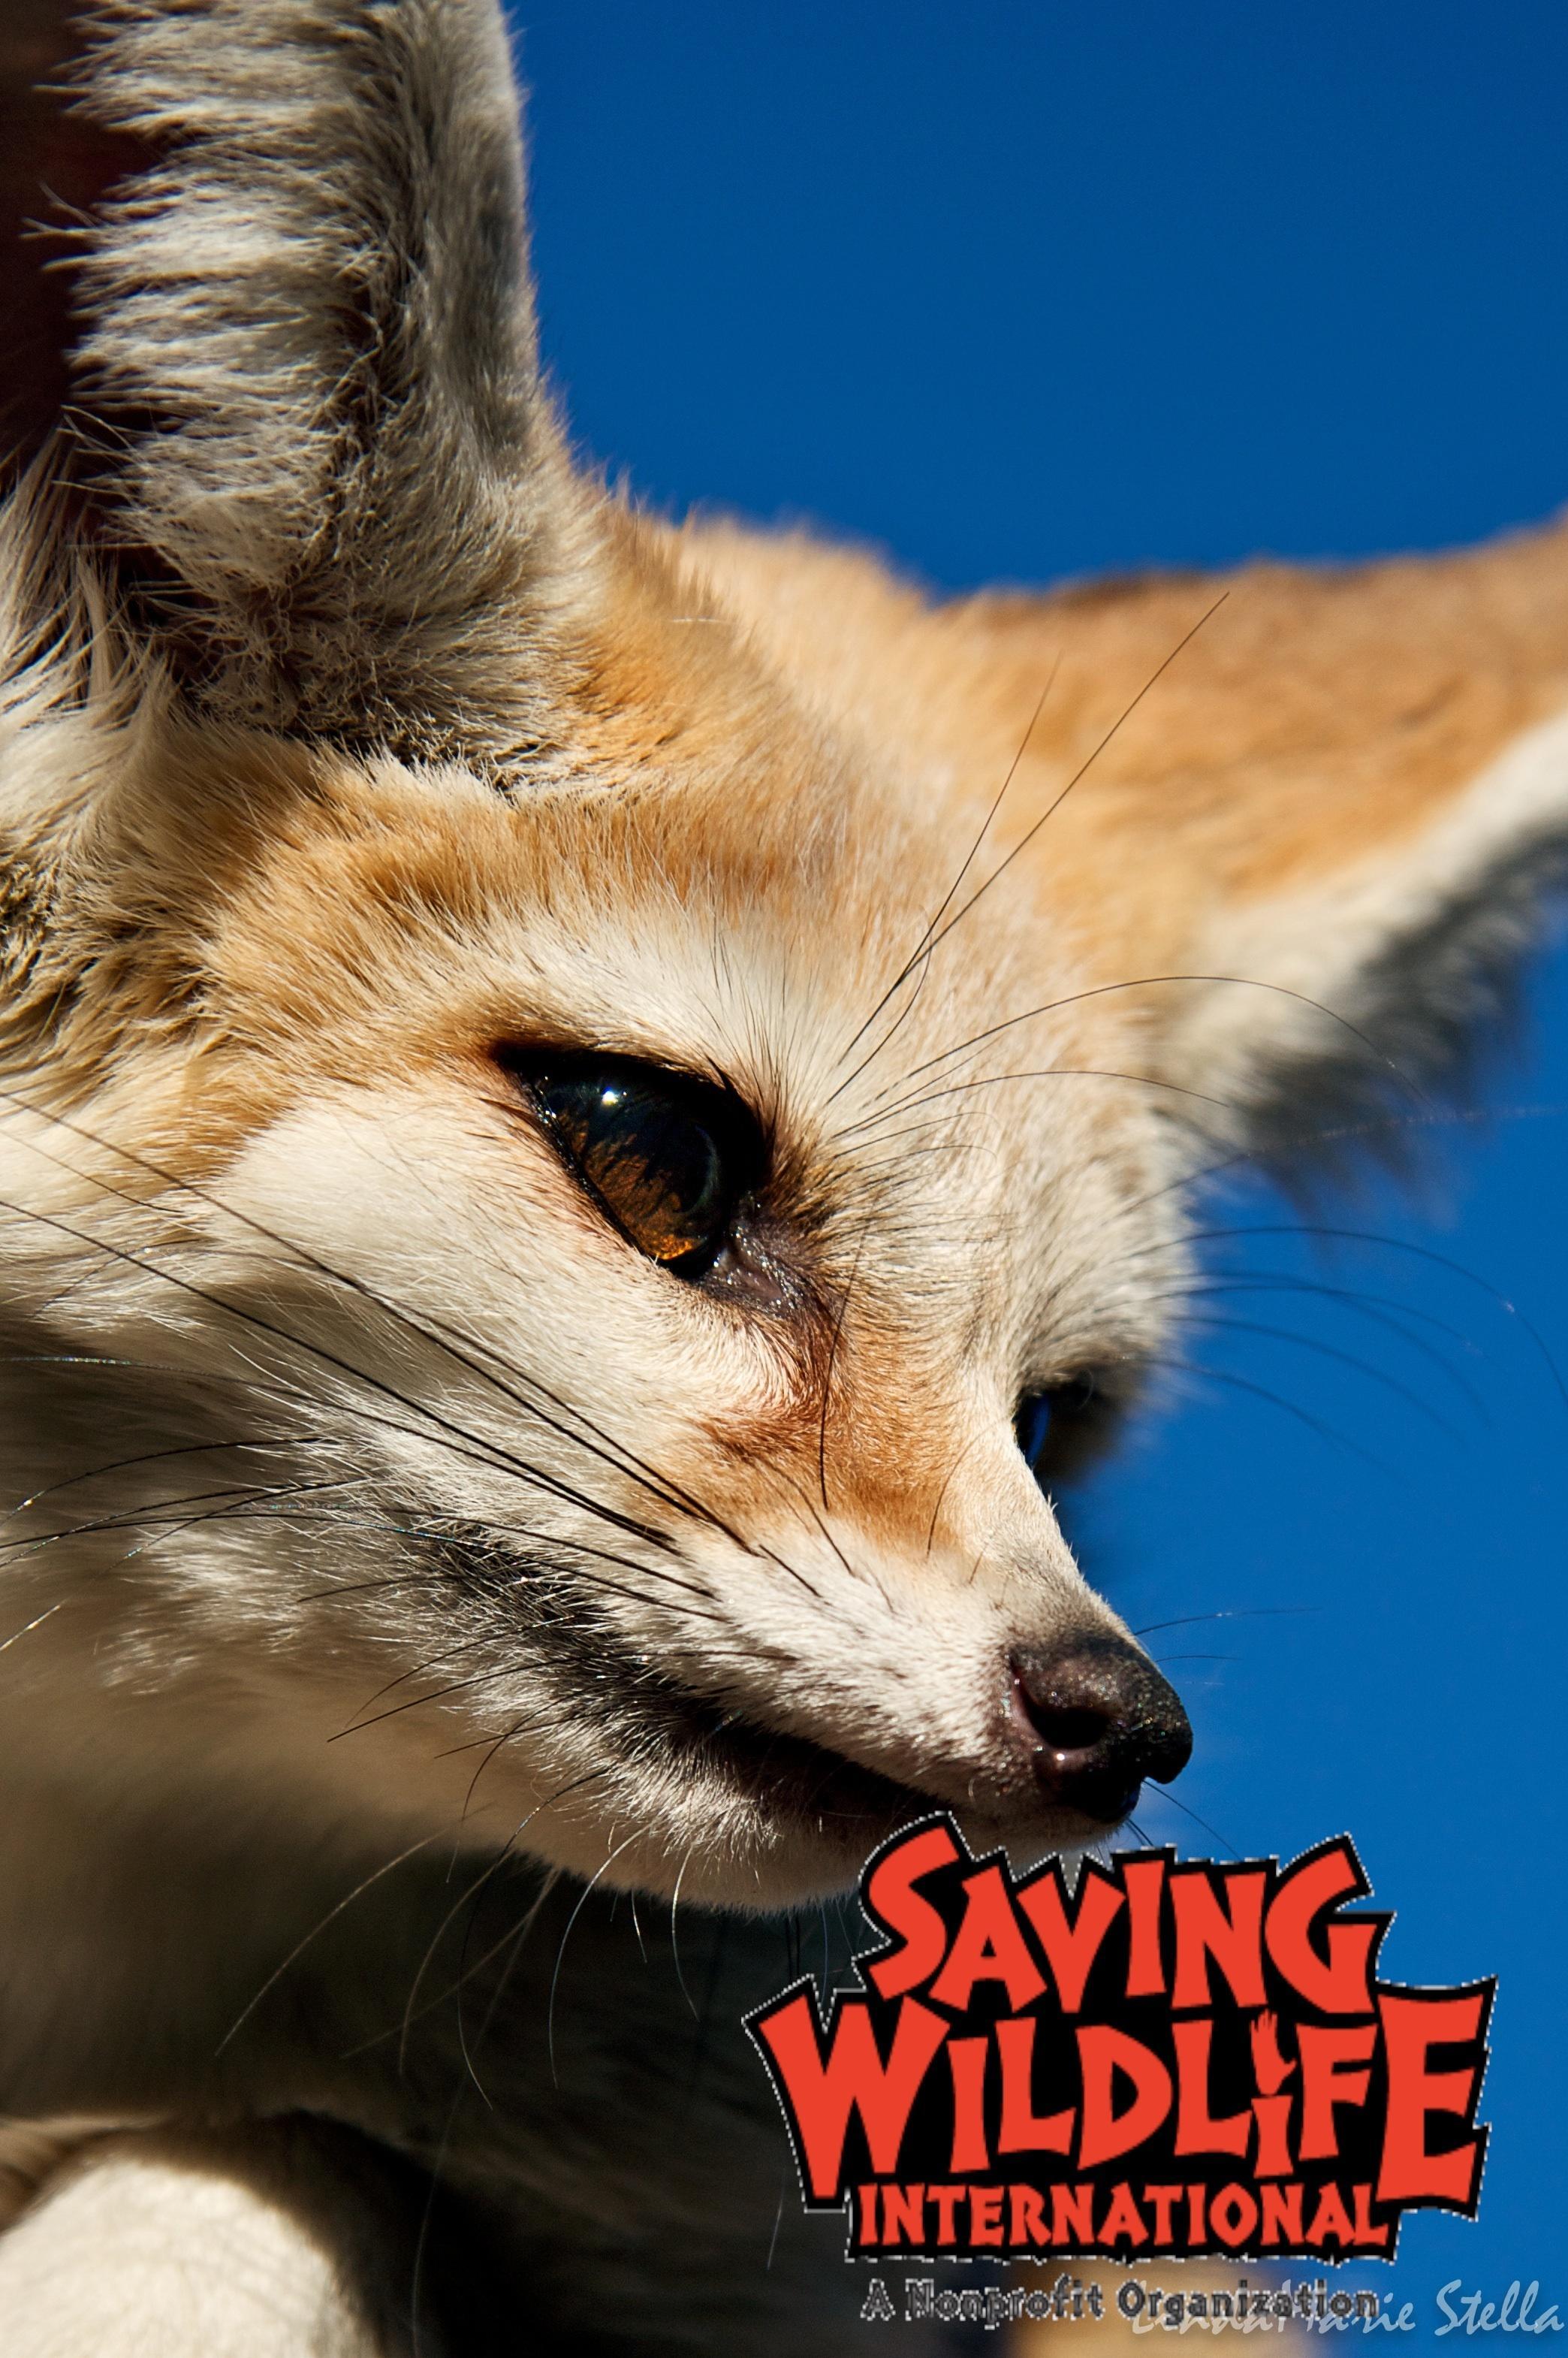 Saving Wildlife International image 5